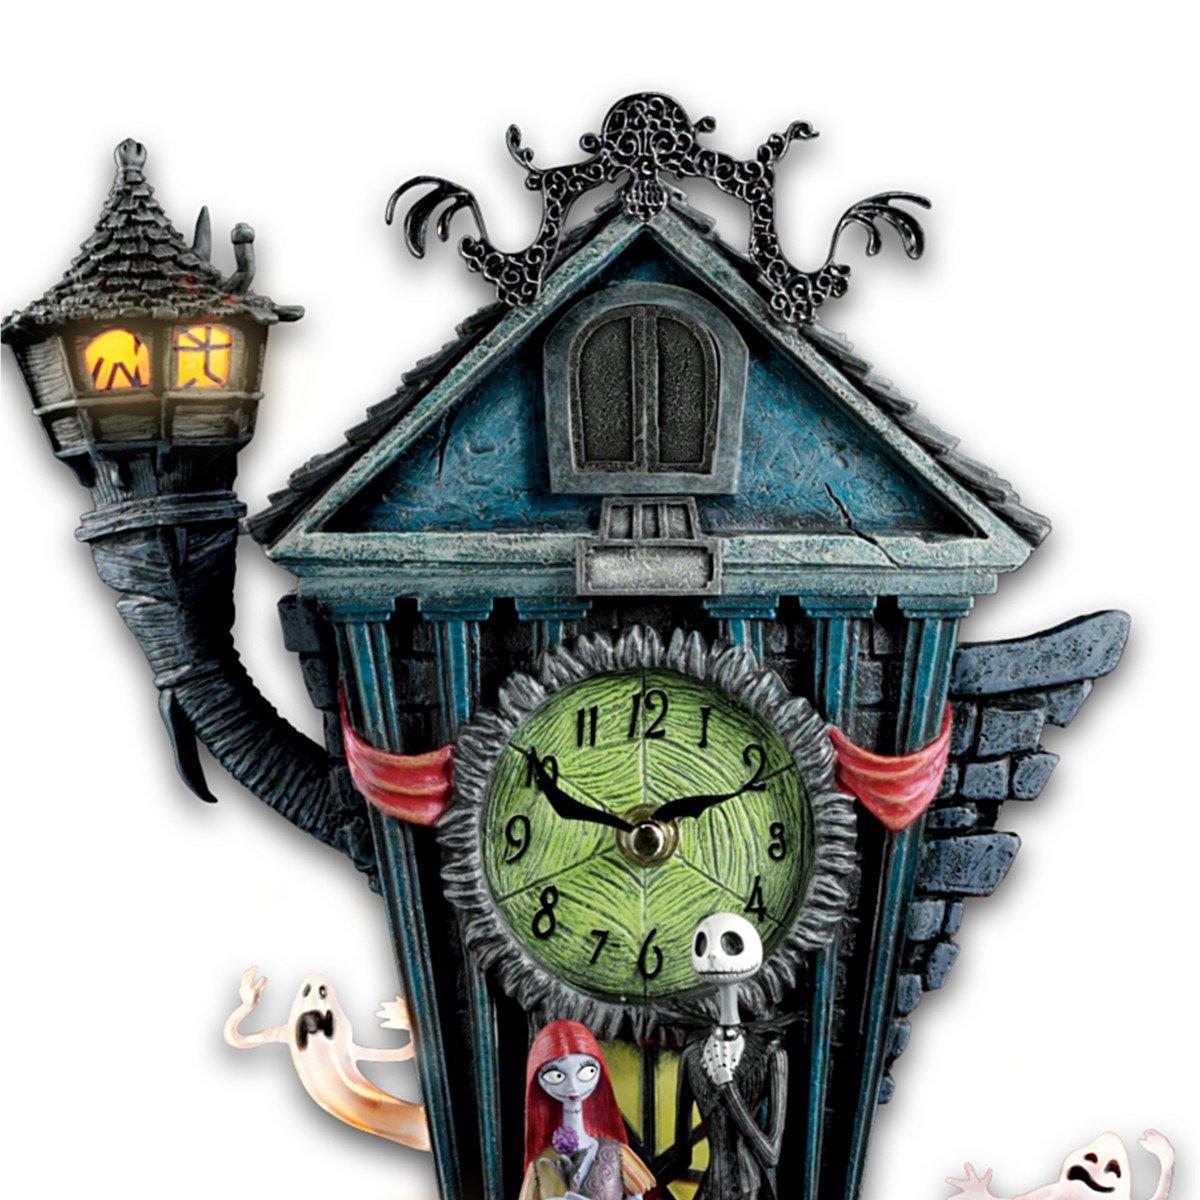 bradford exchange the cuckoo clock tim burtons the nightmare before christmas